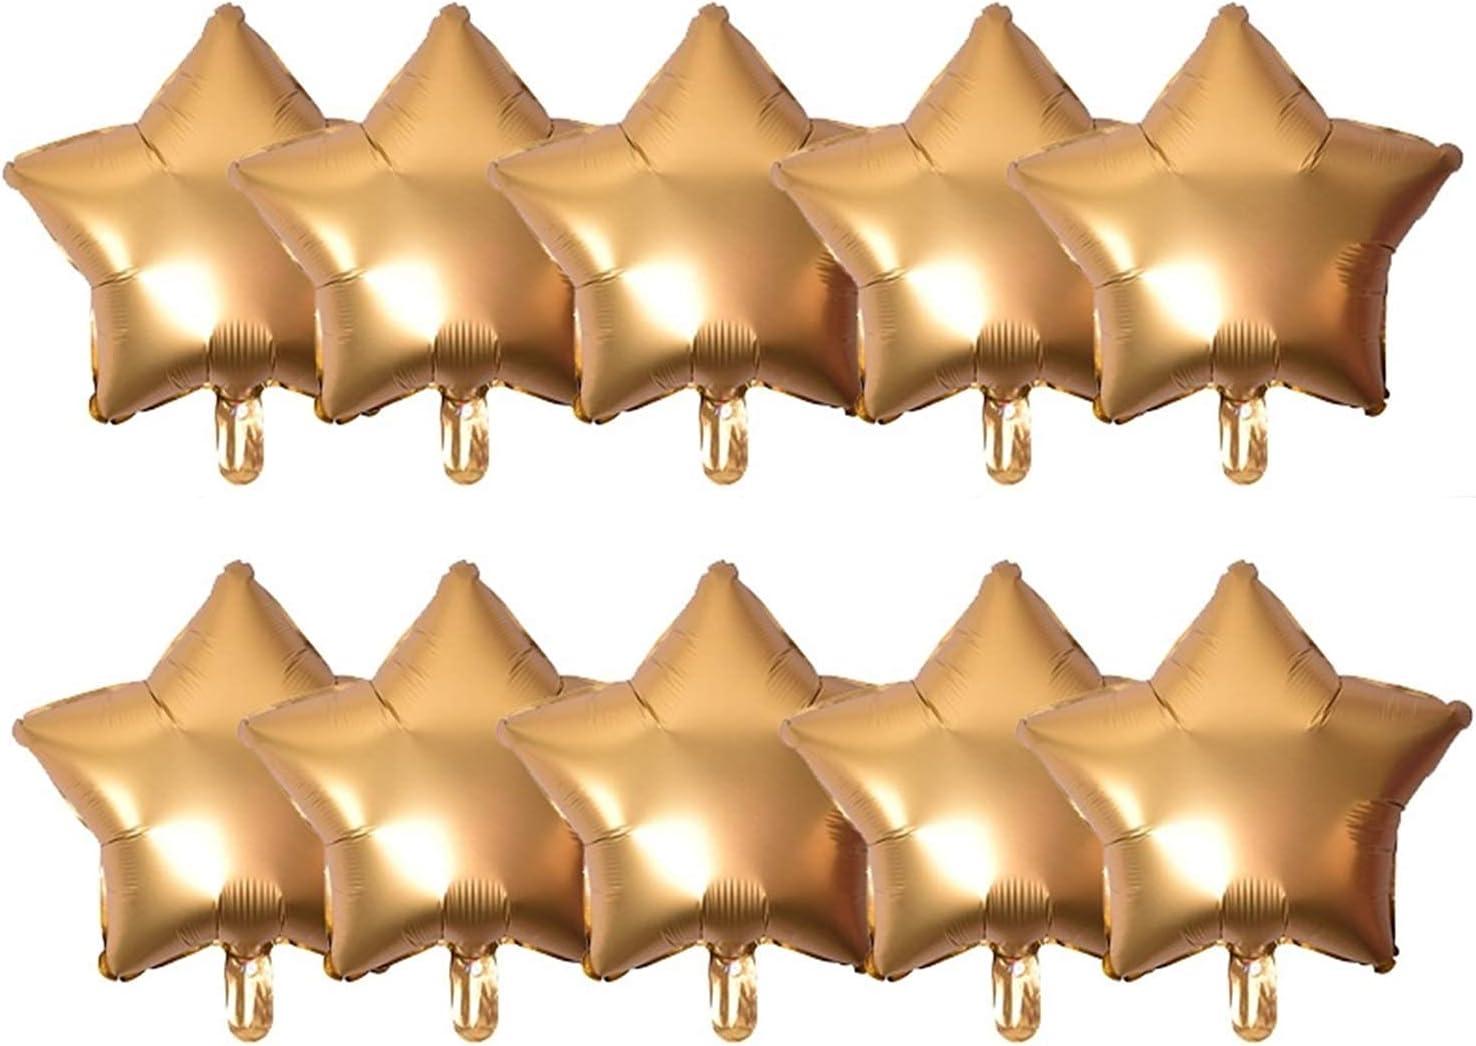 Soldering Children Party Balloons 10pc Confett Discount is also underway Gold Metallic Foil